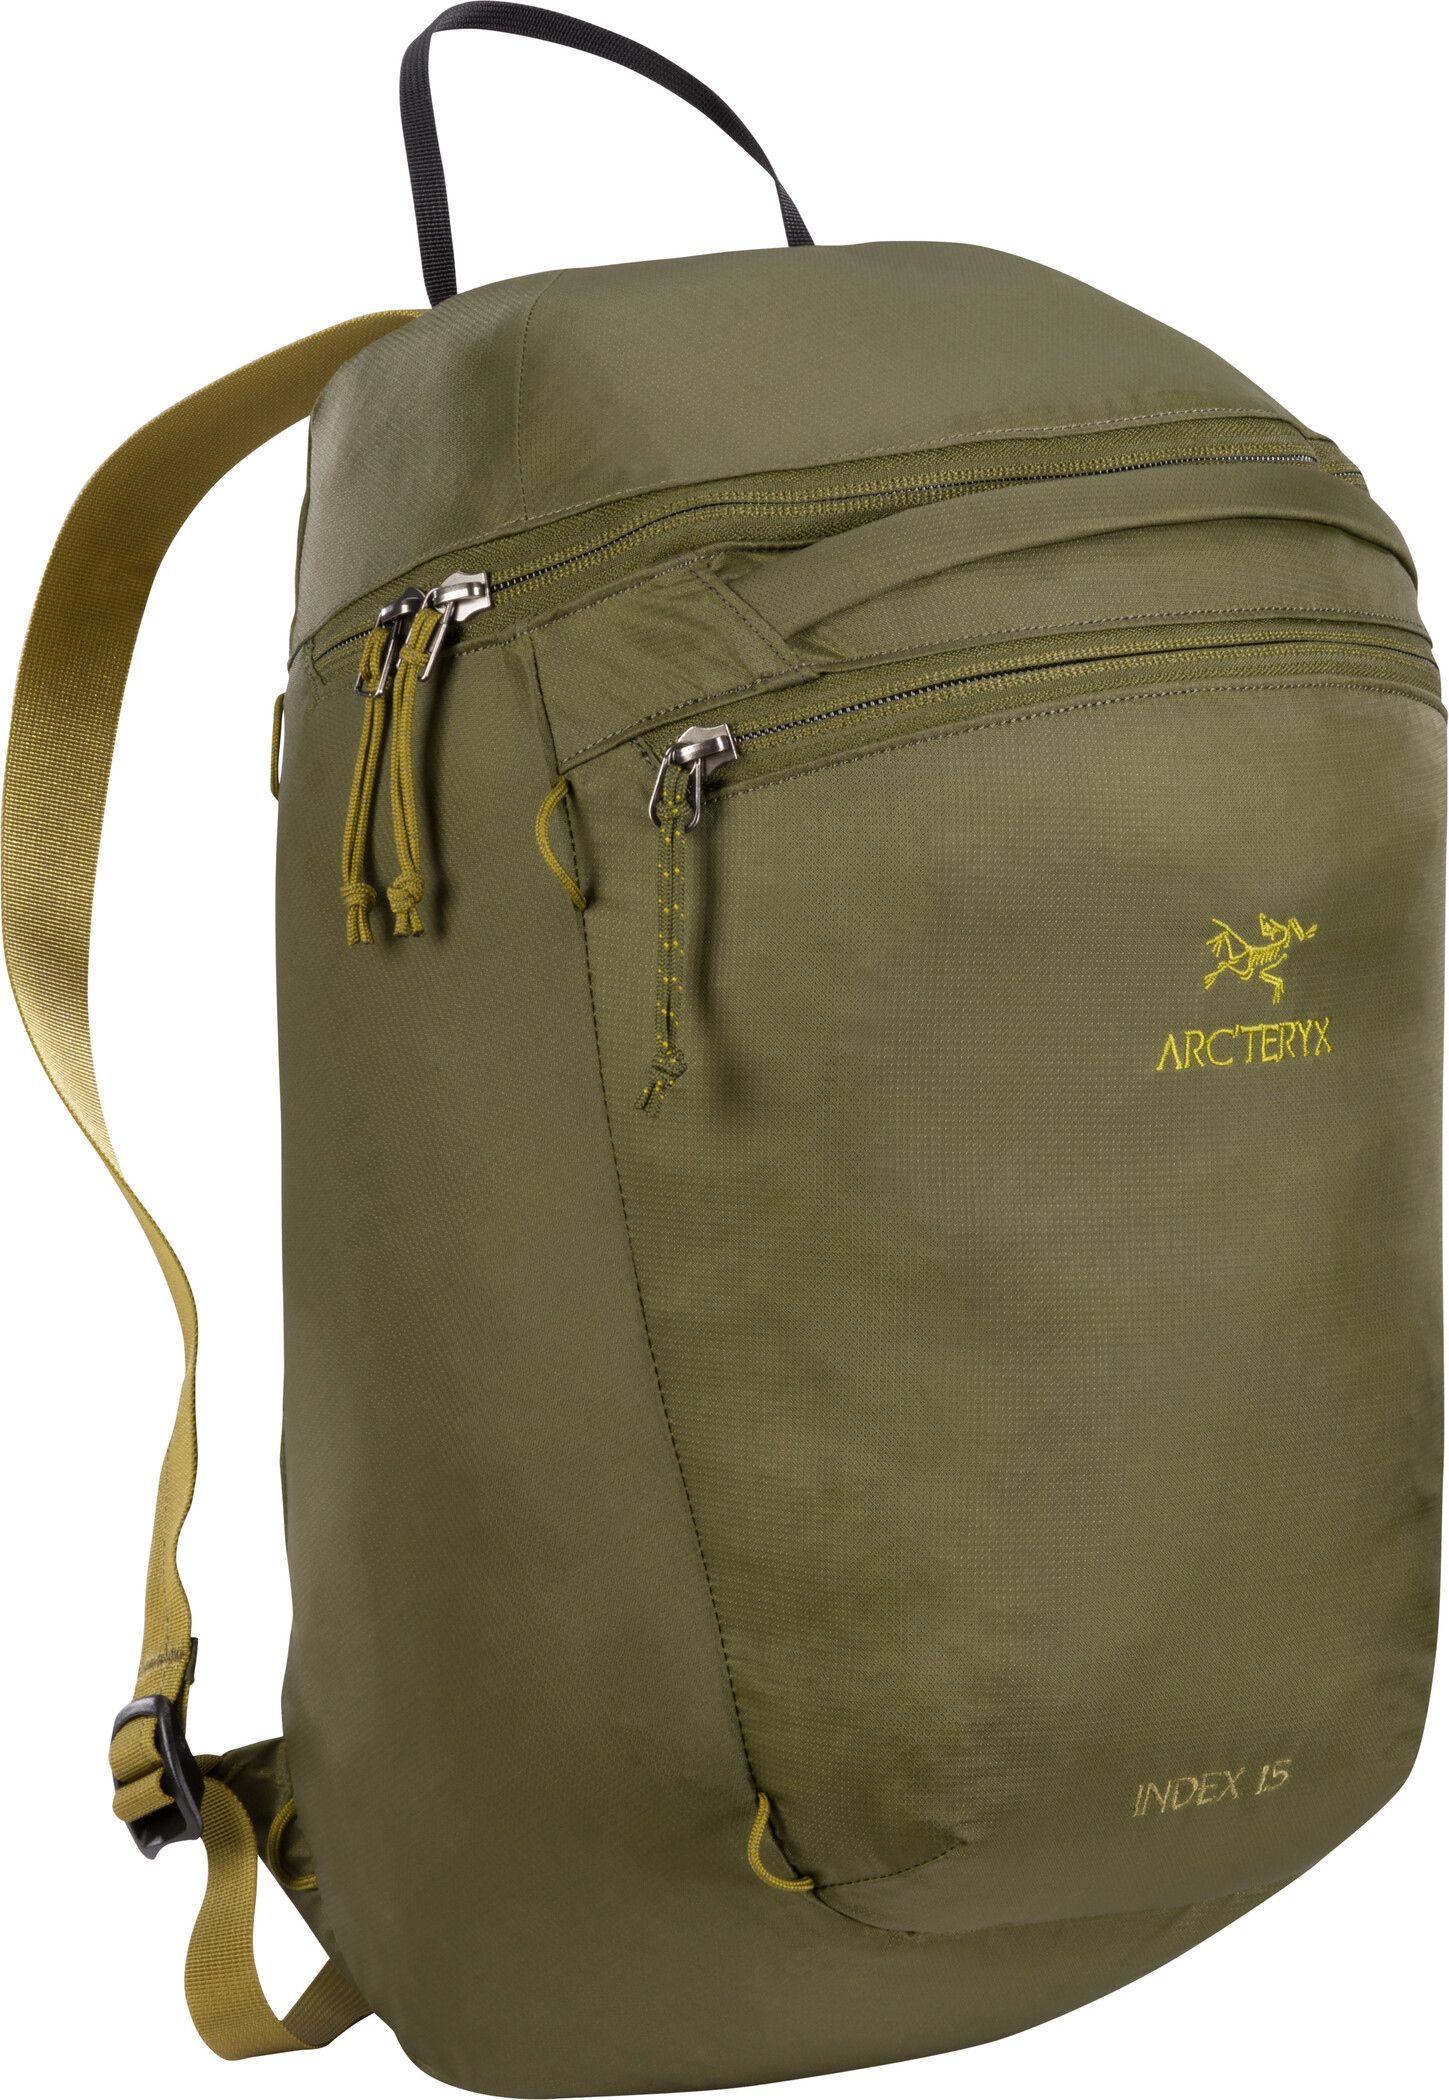 Arc'teryx Index 15 Rygsæk, bushwhack (2019)   Travel bags